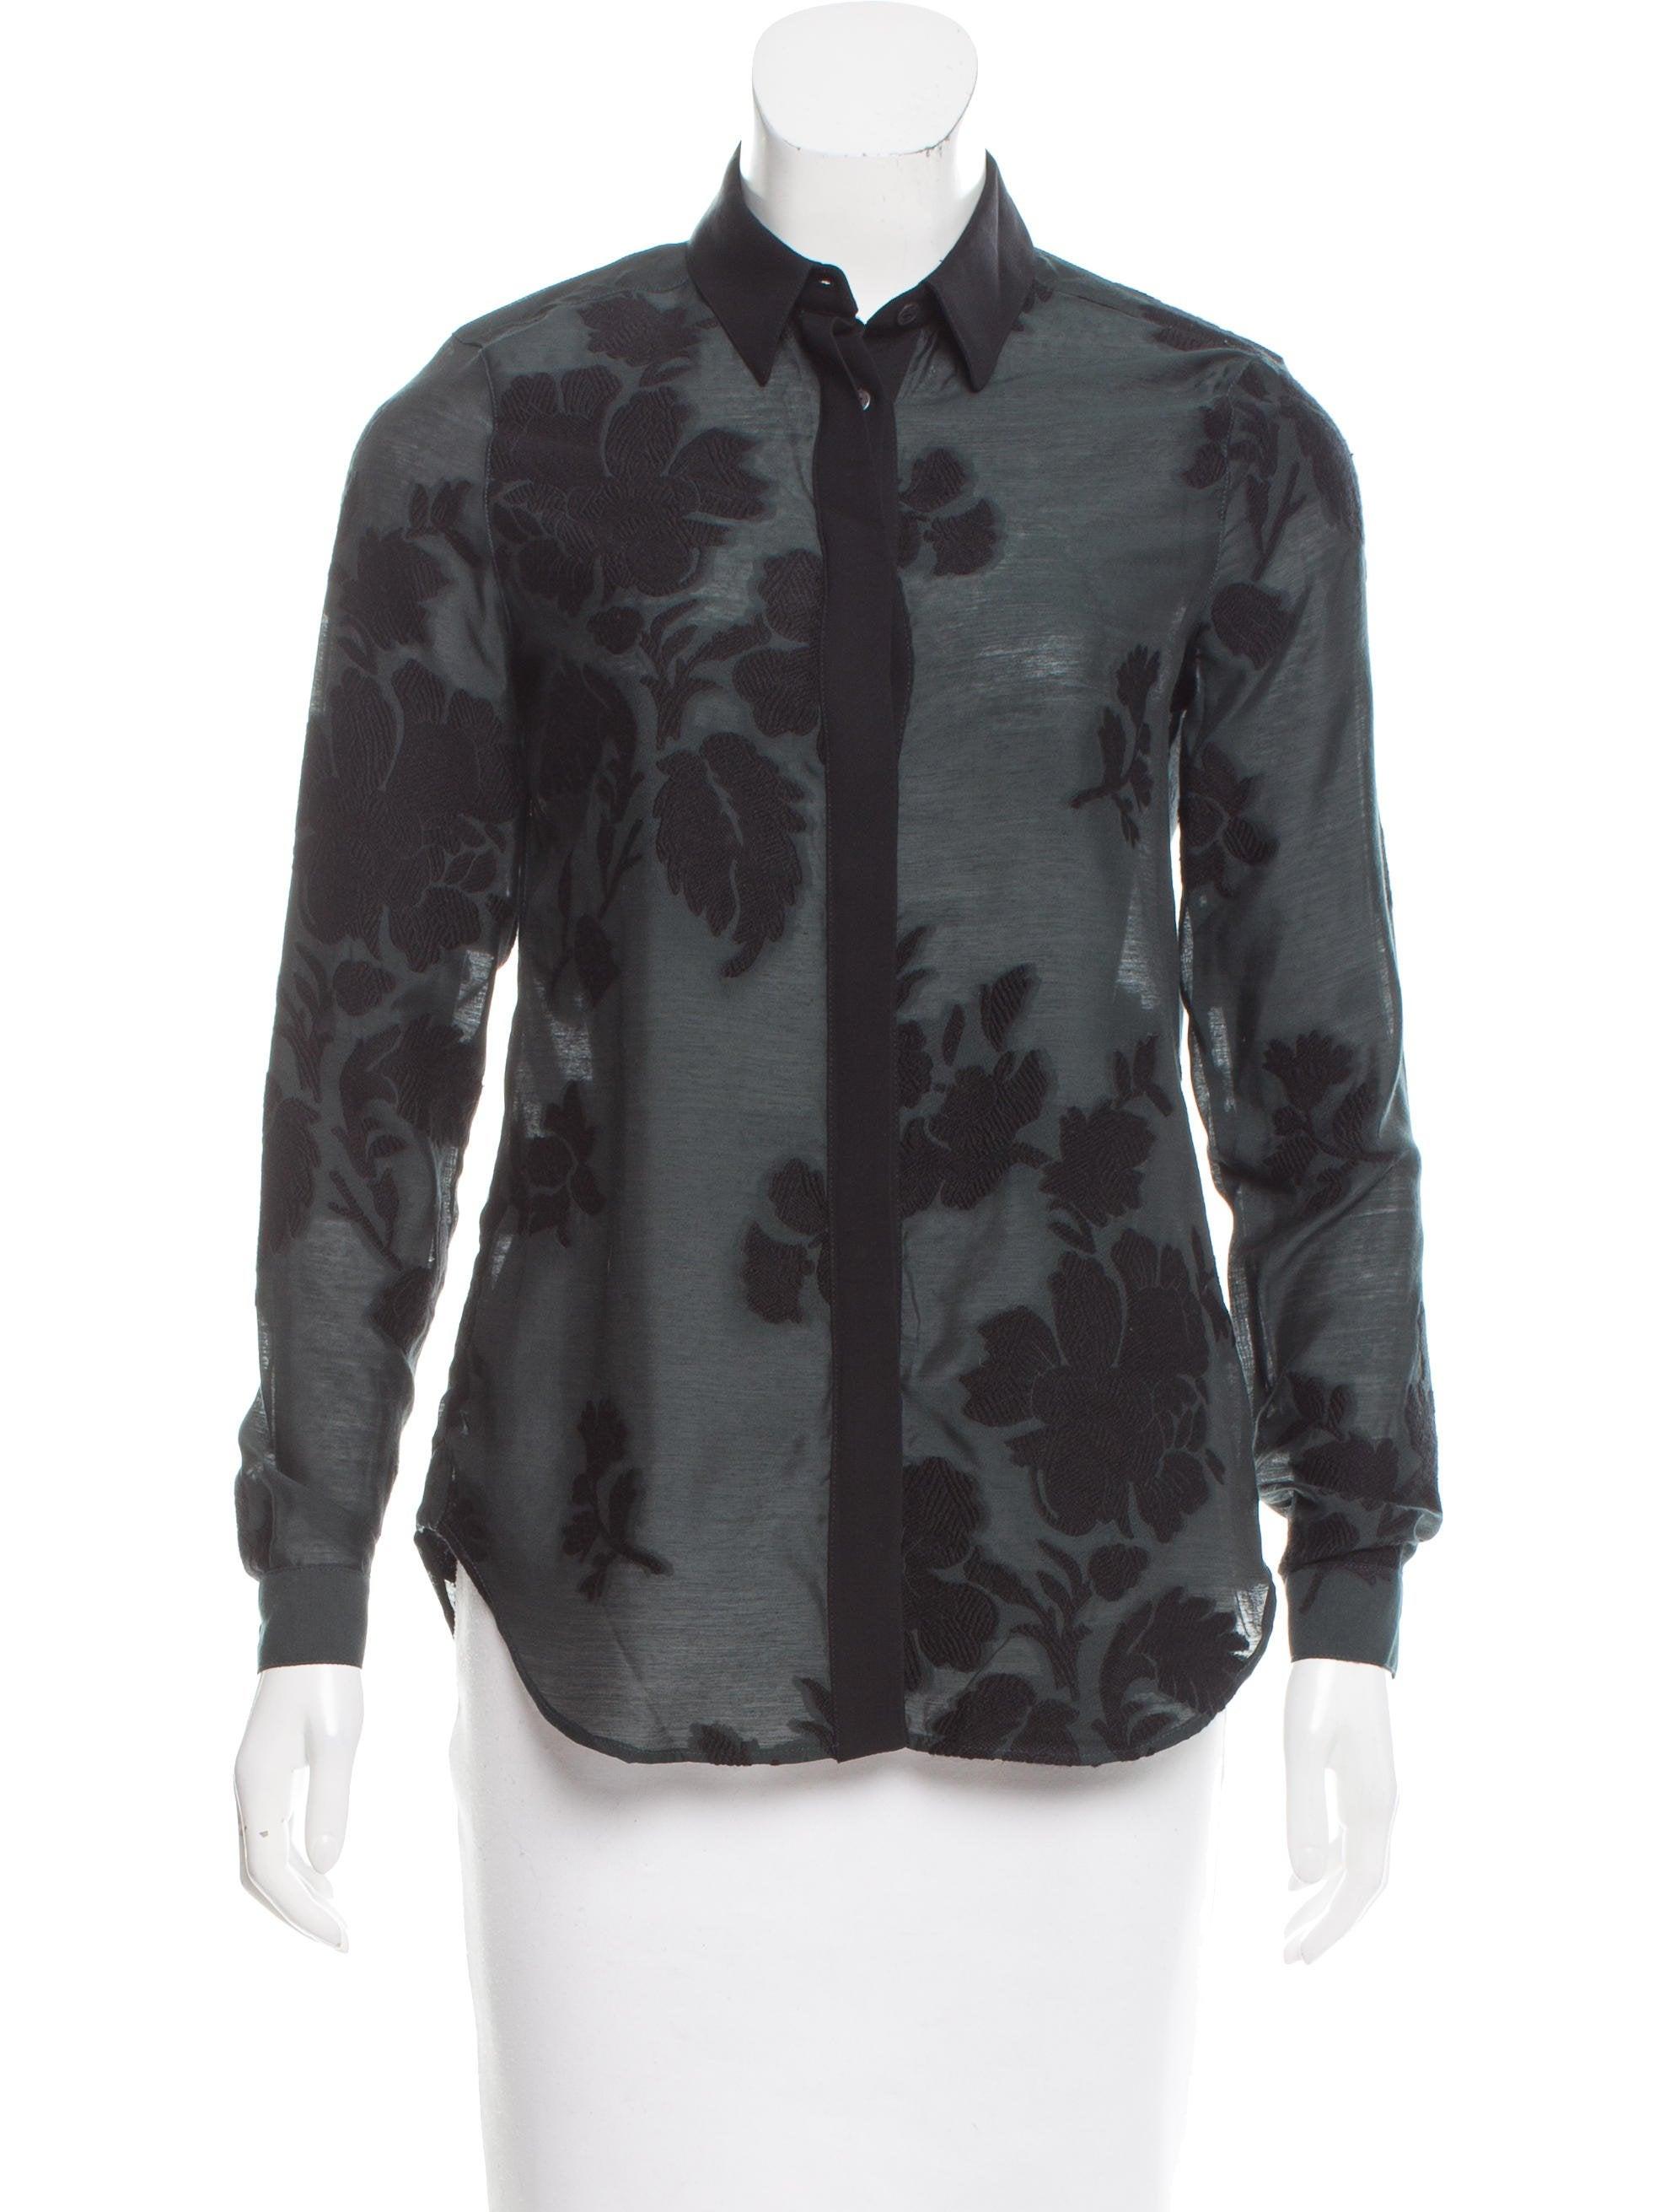 Burberry wool blend button up top clothing bur71490 for Best wool shirt jackets